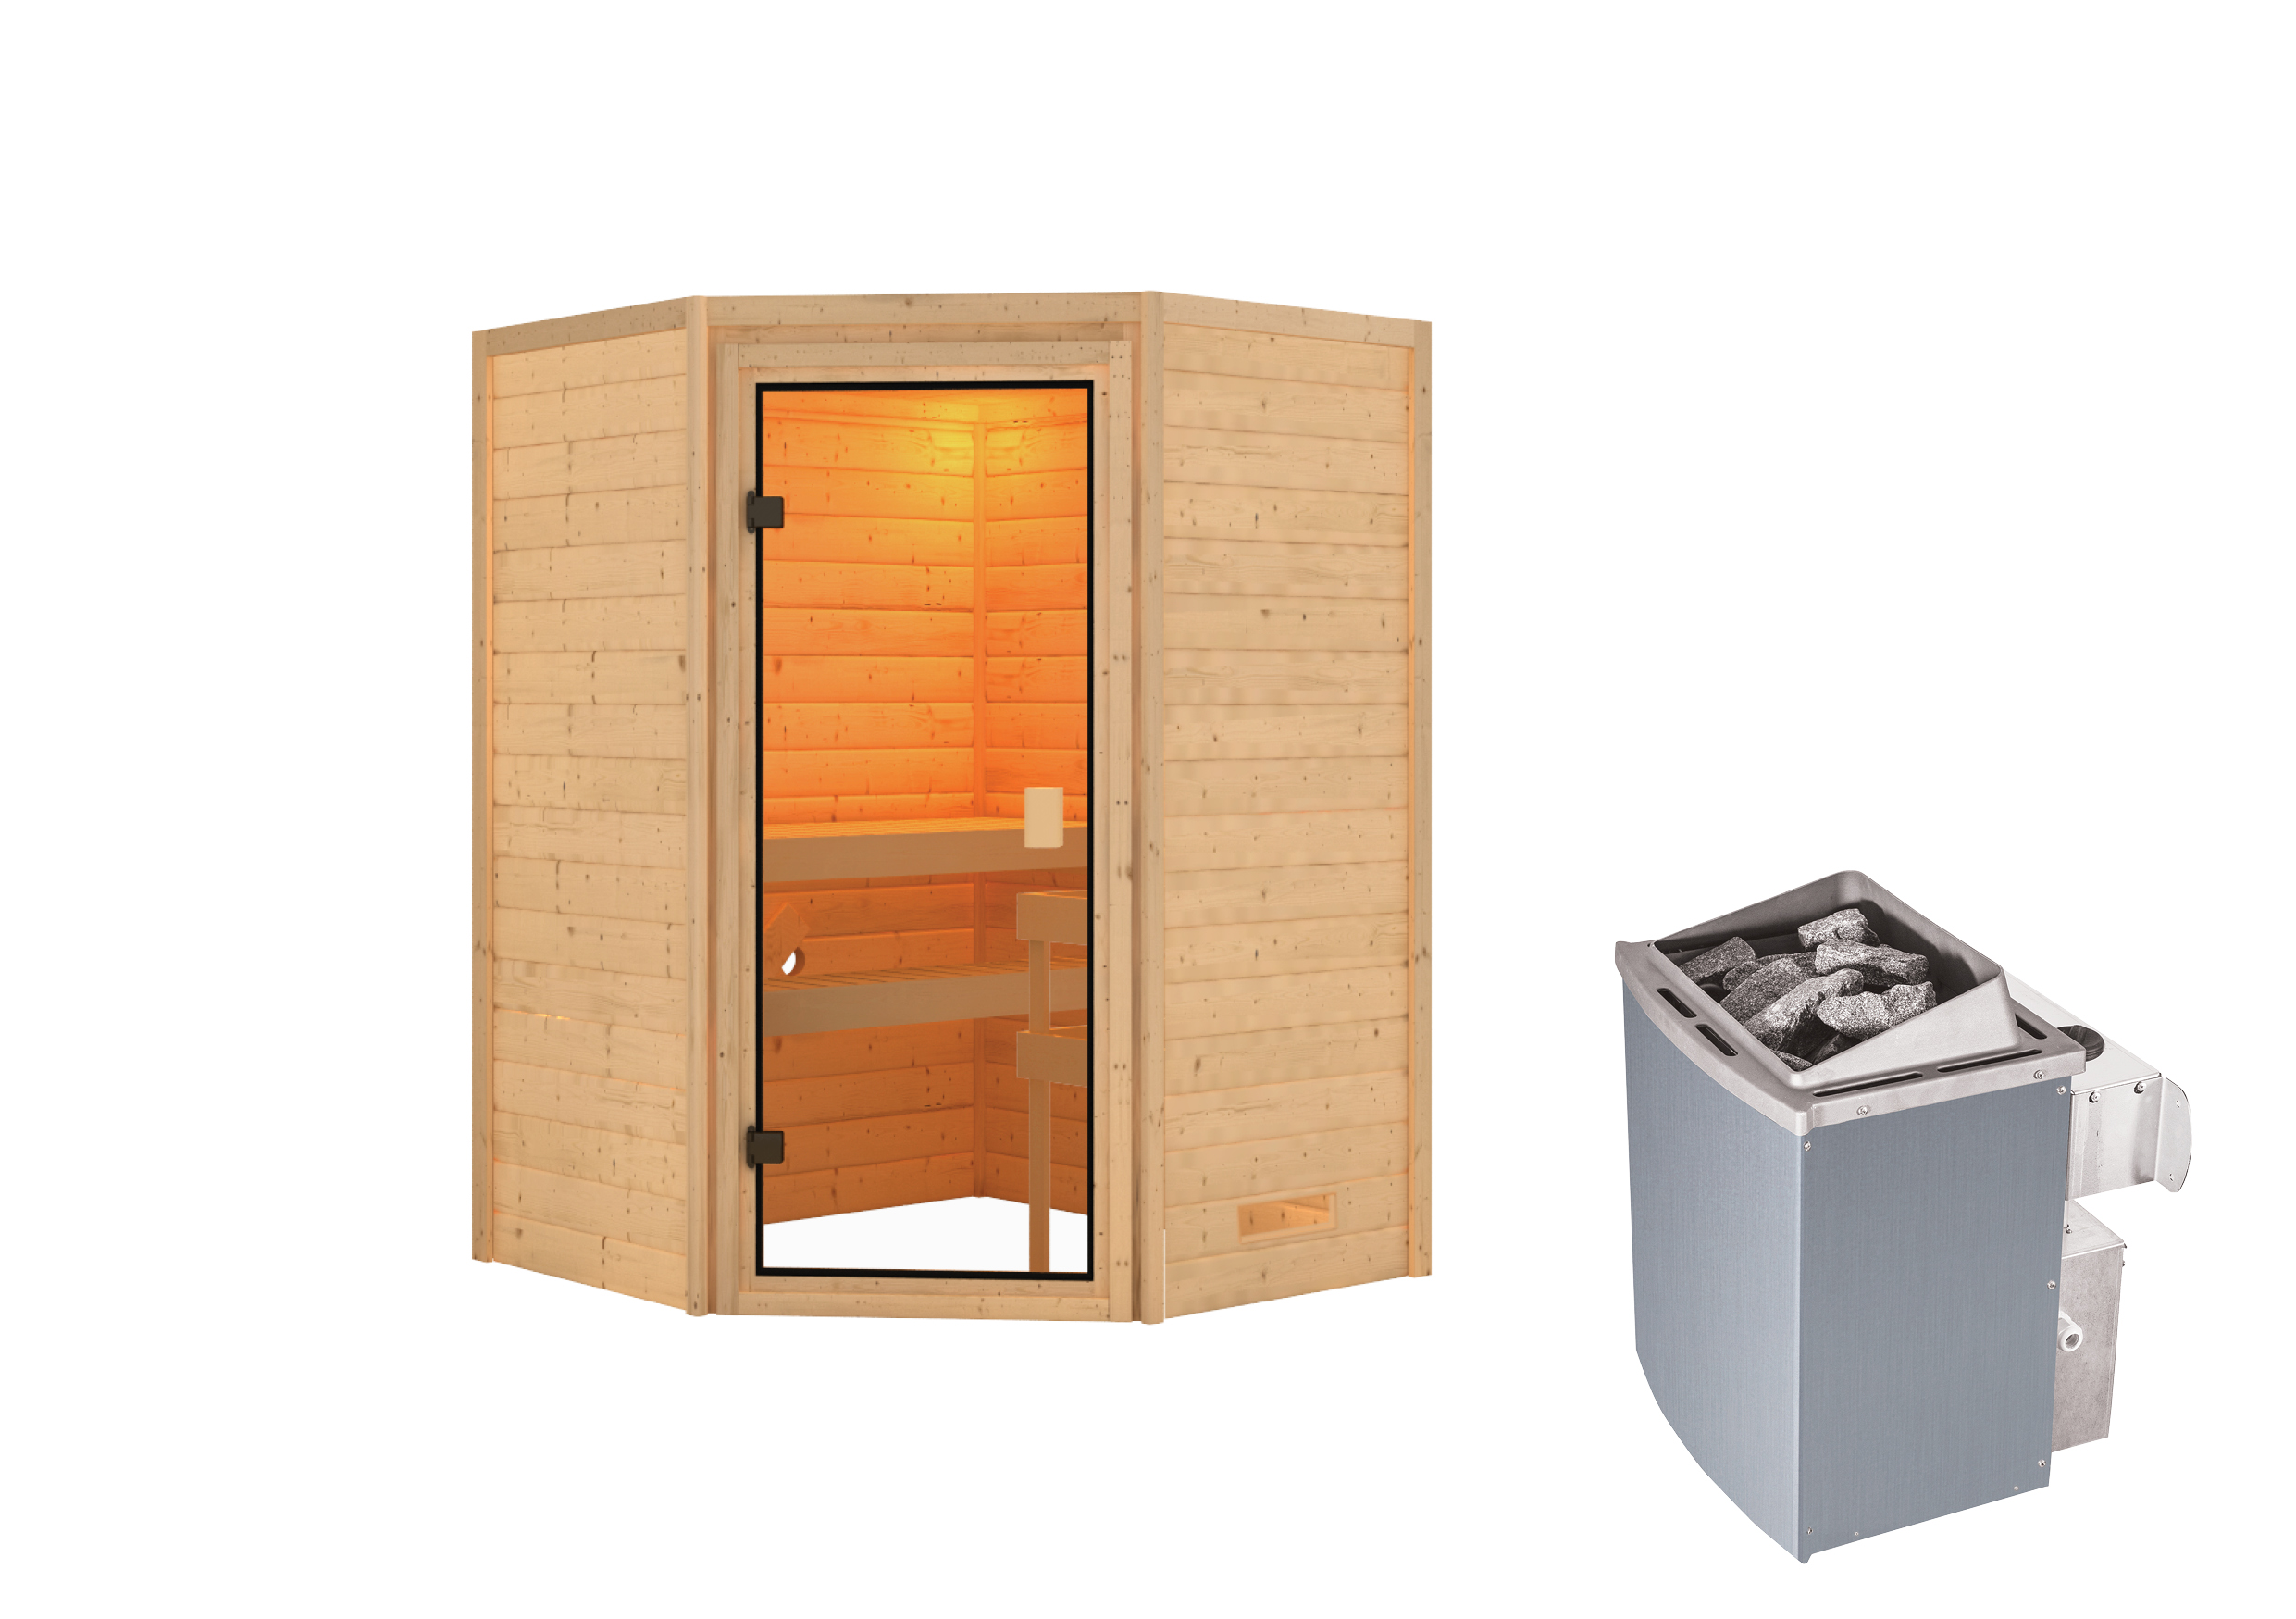 Woodfeeling Sauna Antonia 38mm Saunaofen 9 kW intern Bild 6